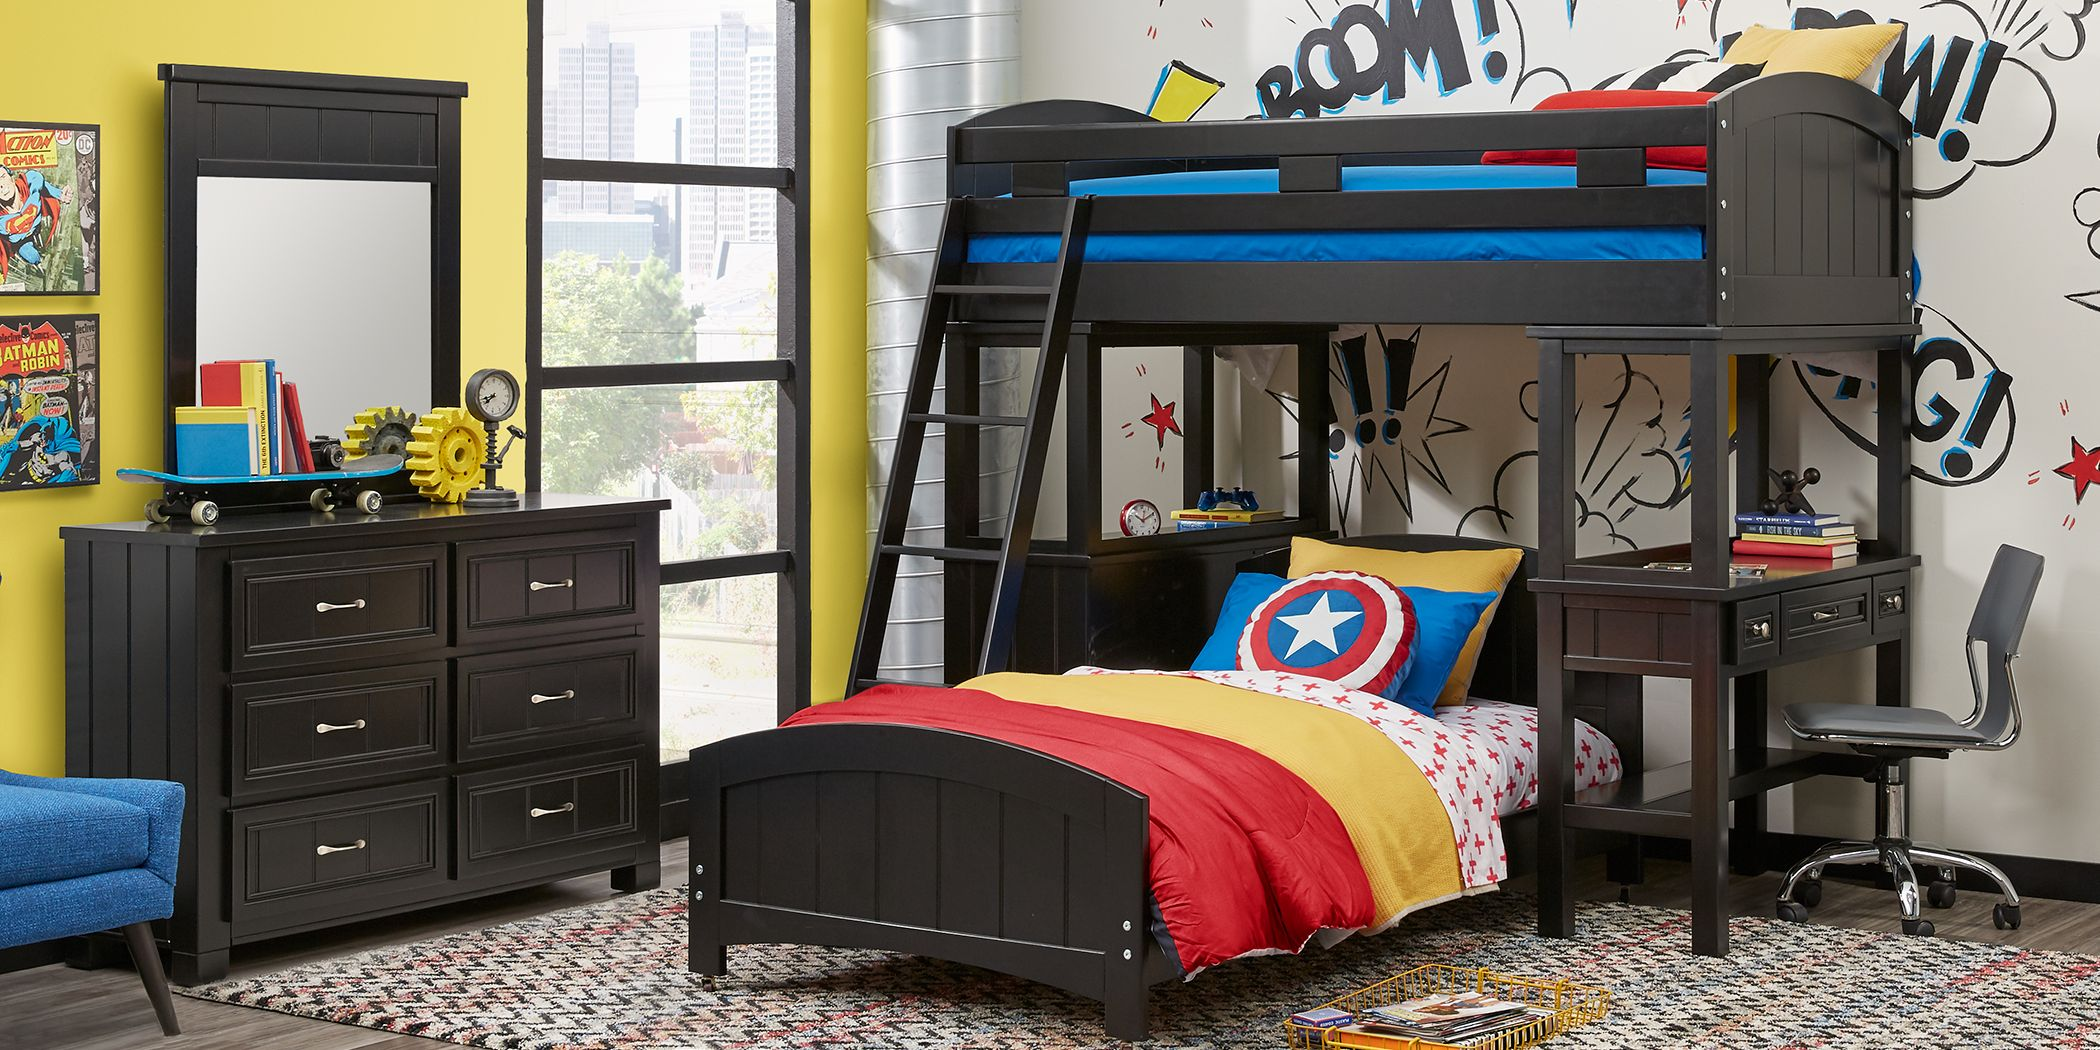 Cottage Colors Black Twin Loft Bunk with Desk and Dresser